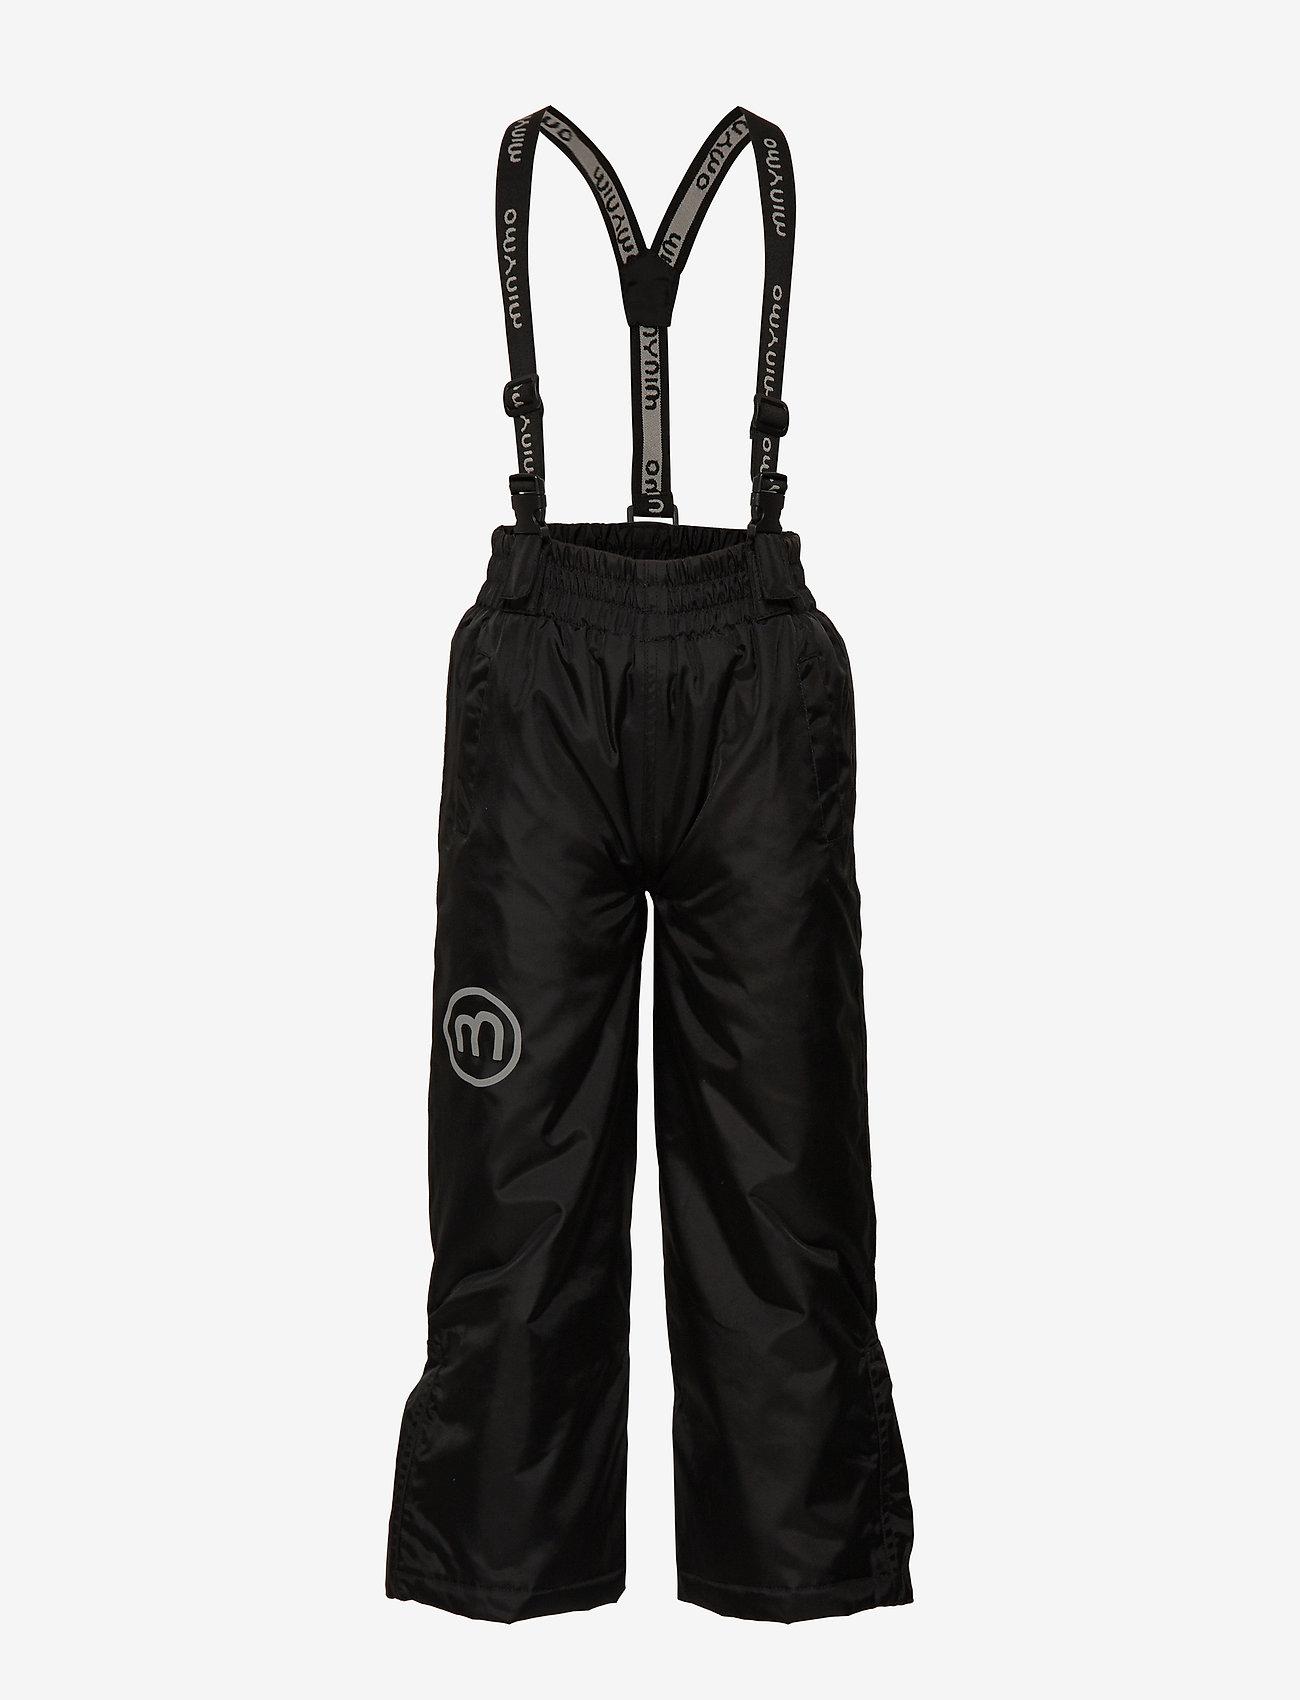 Minymo - Basic 55 -Snowpant -solid - winterbroeken - black - 0